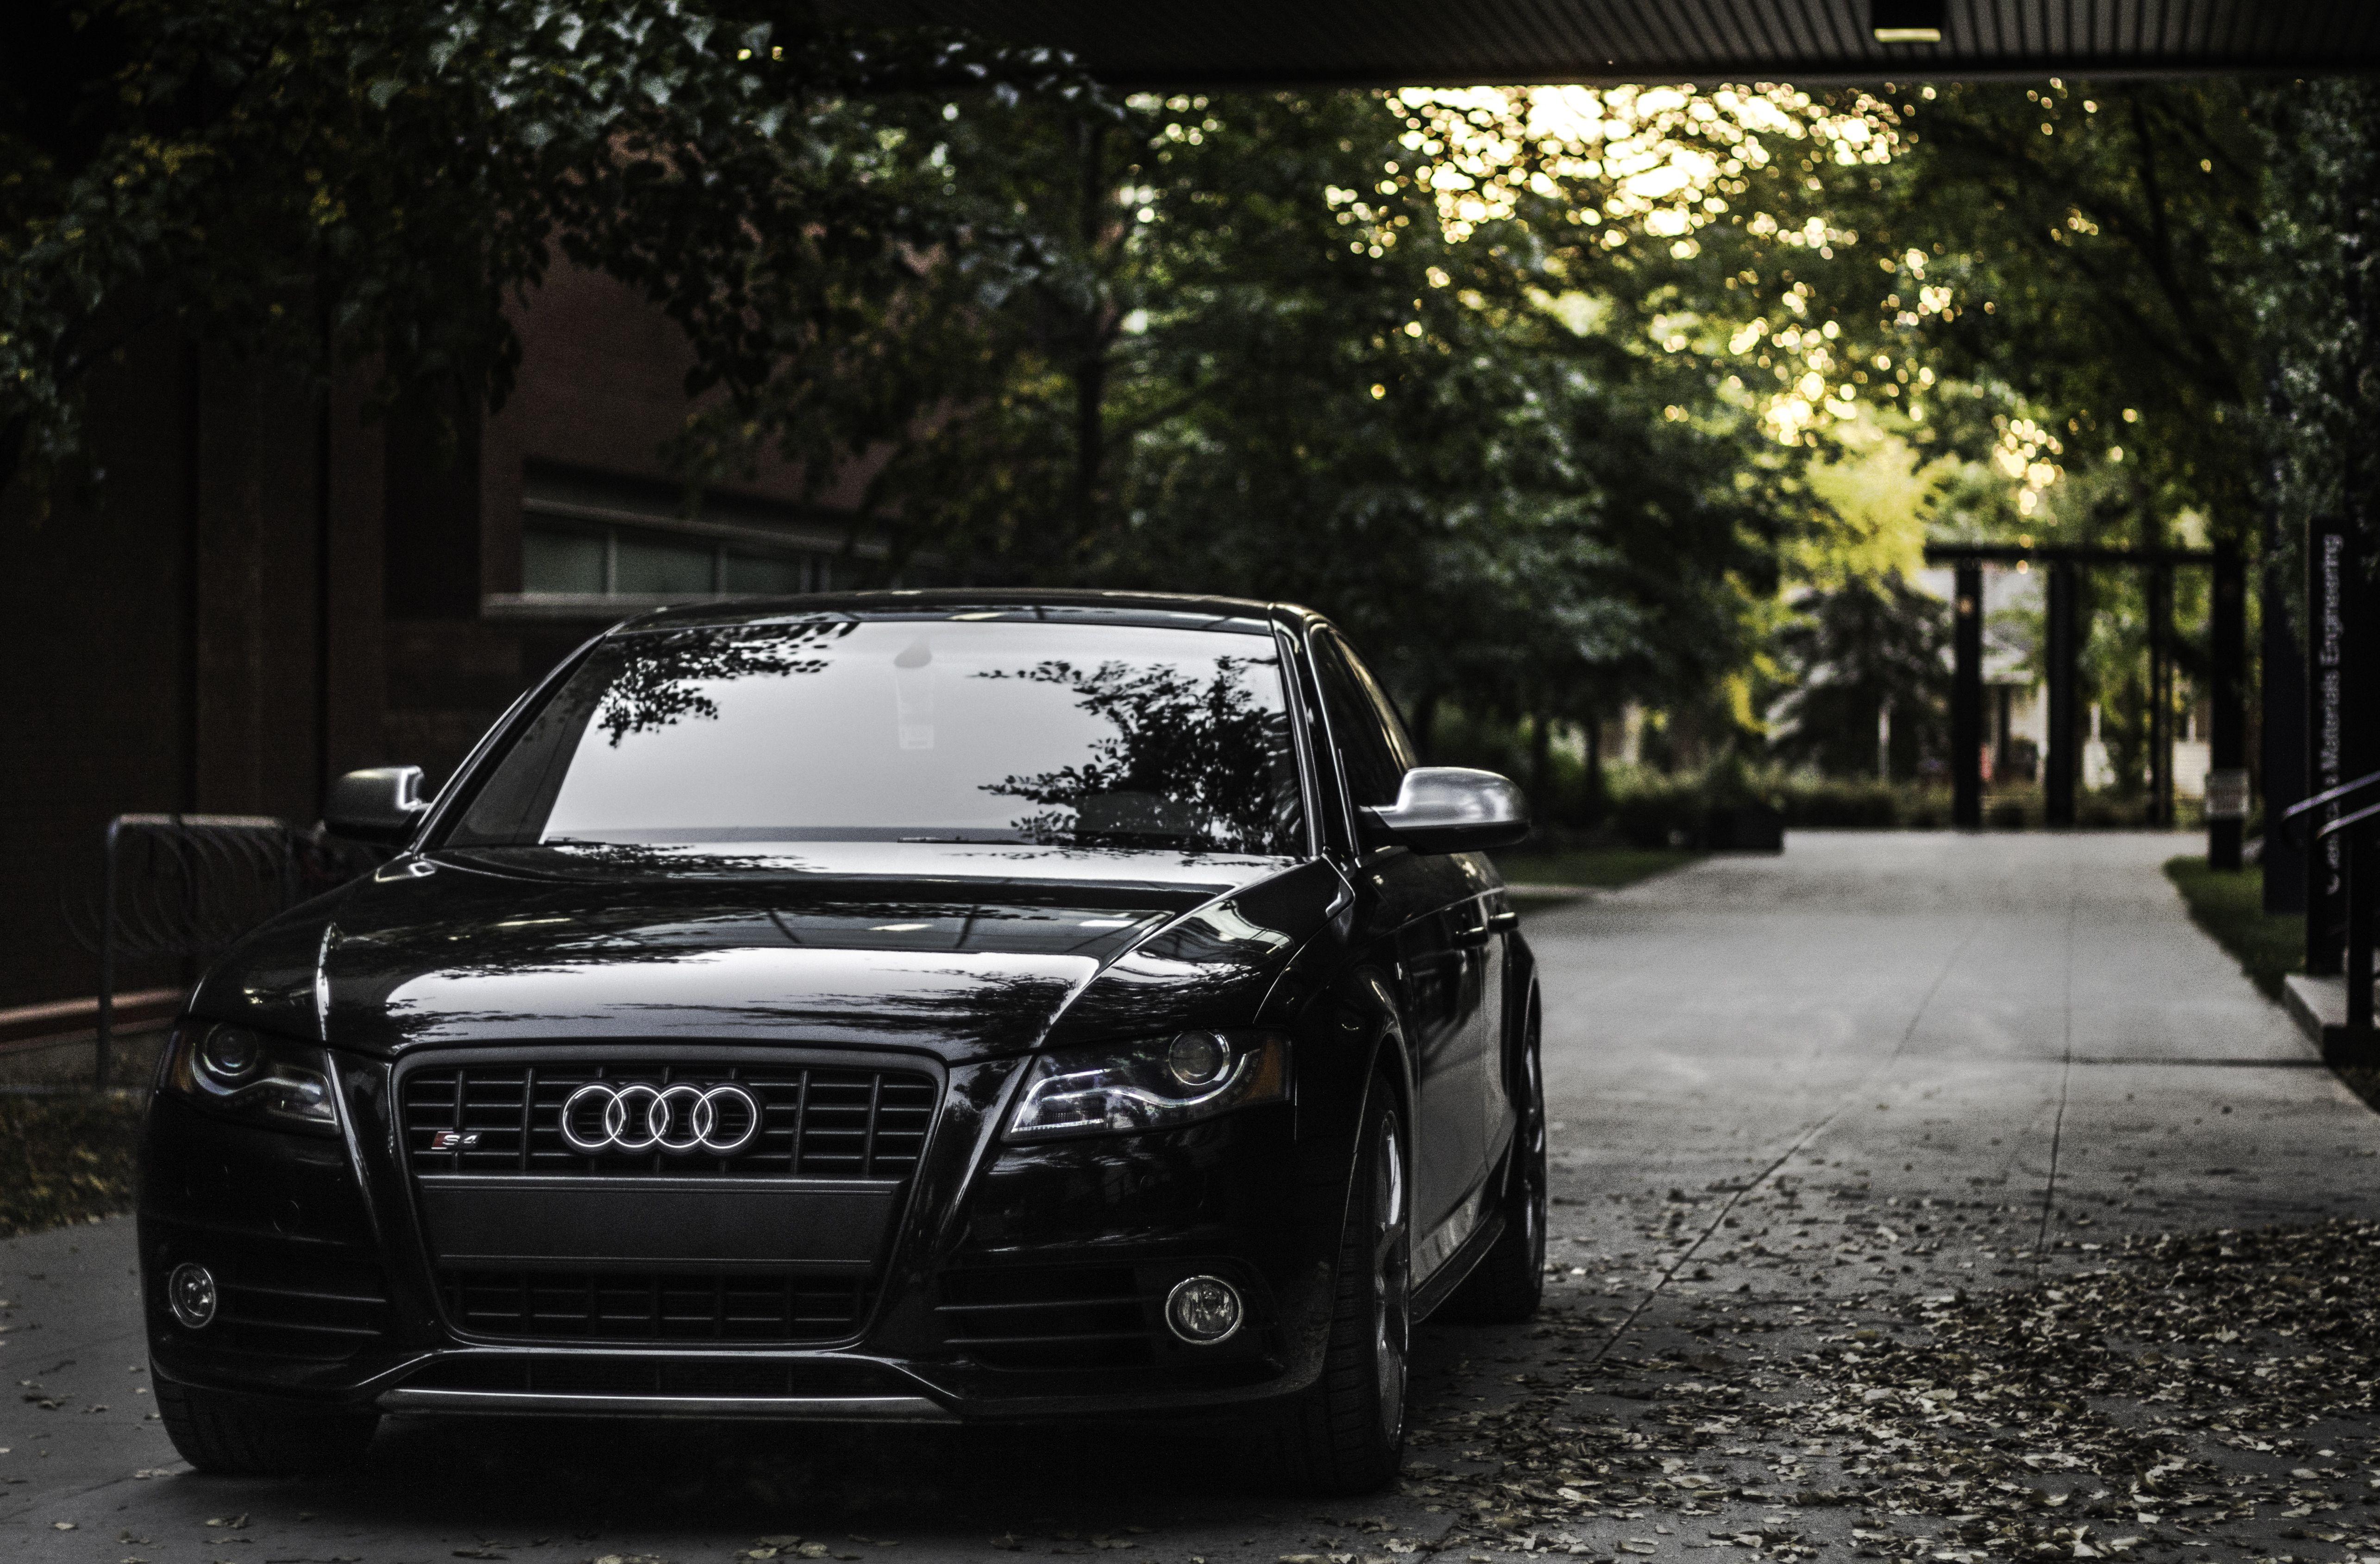 Audi S4 Audi Favorites Pinterest